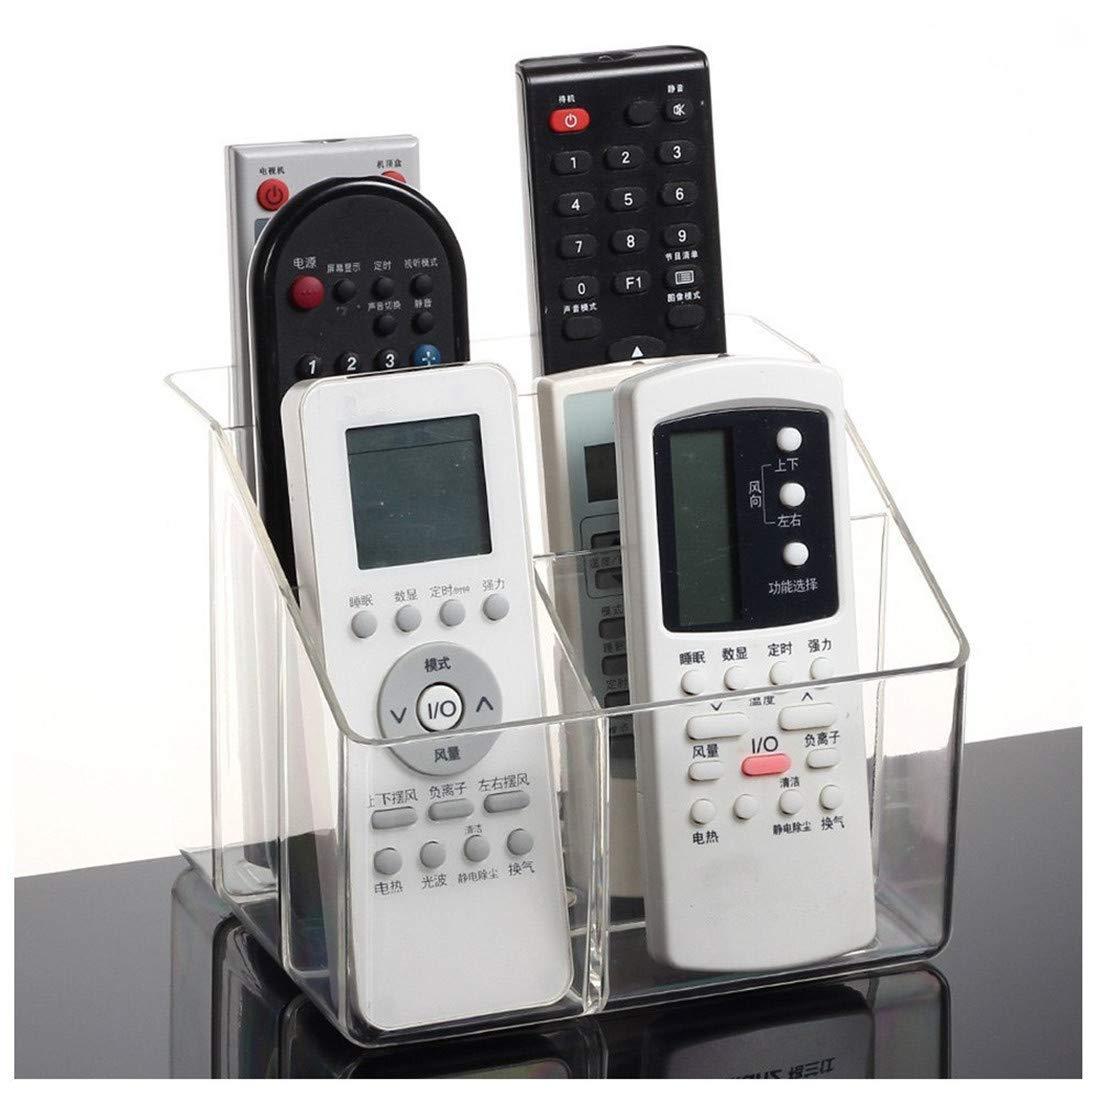 Ivosmart Clear Acrylic TV Remote Control Storage Holder Organizer Caddy by Ivosmart